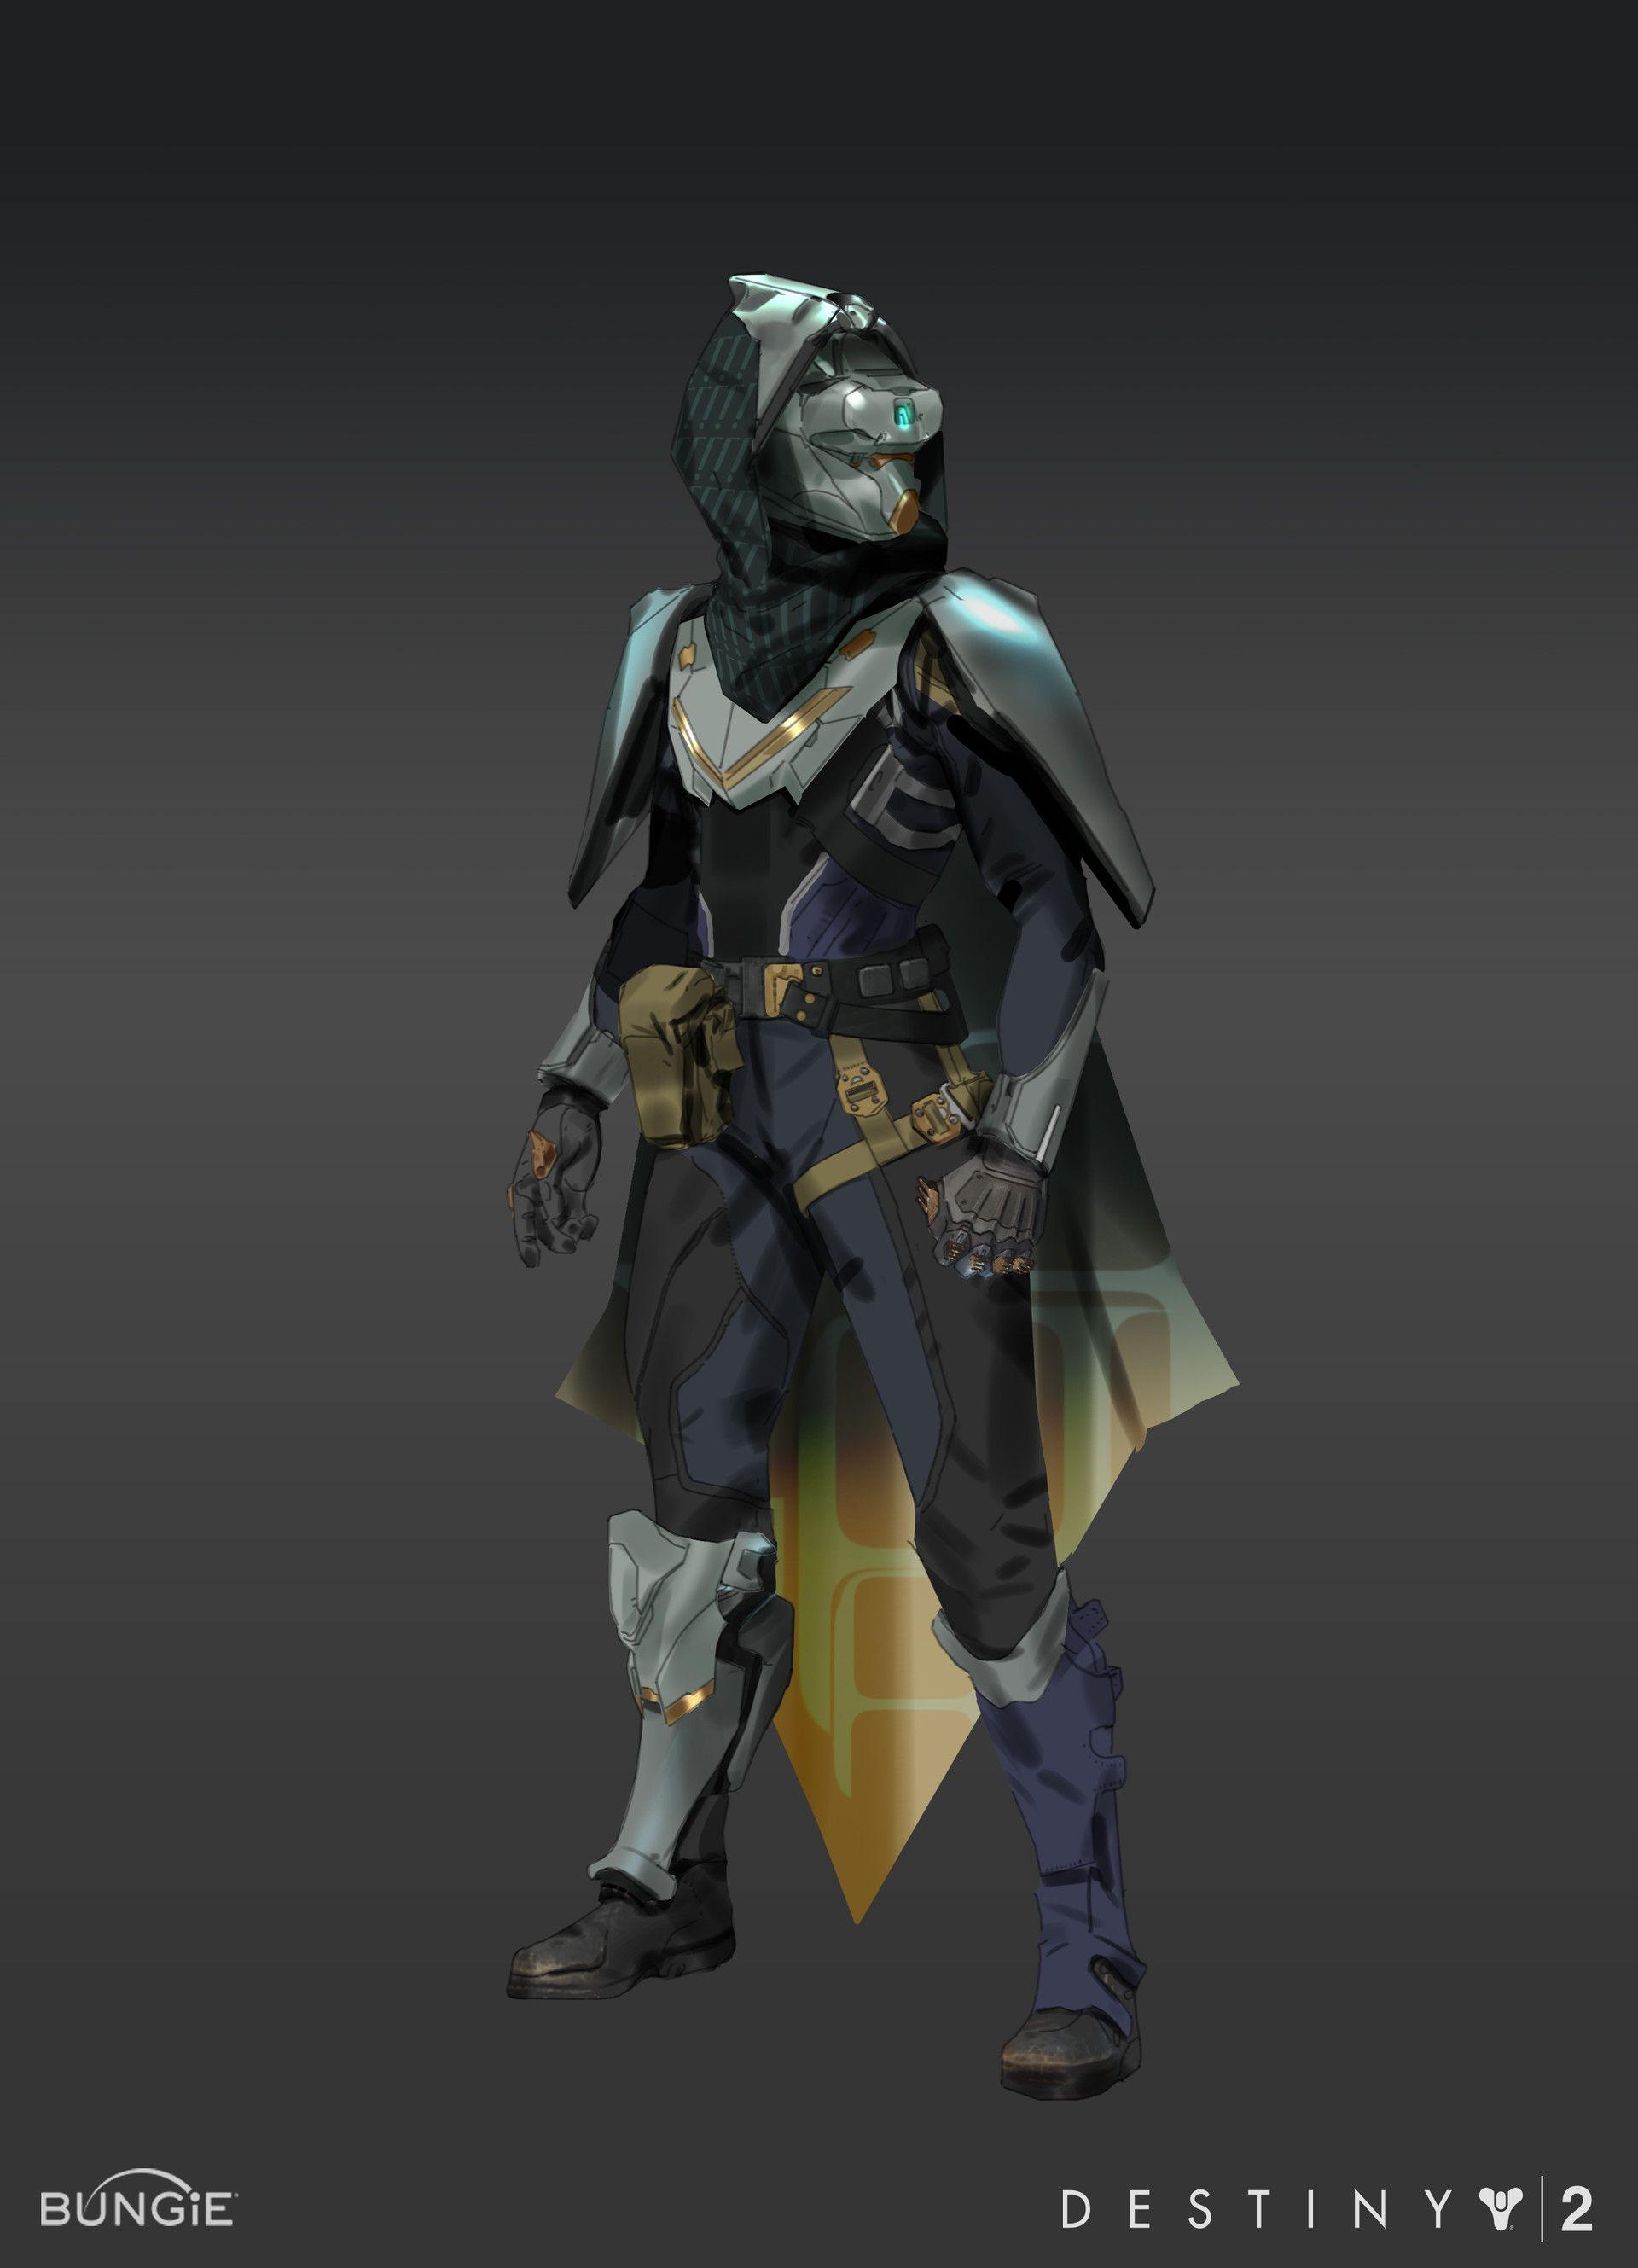 Hunter Titan And Warlock Sets Done For The Curse Of Osiris DLC Destiny 2